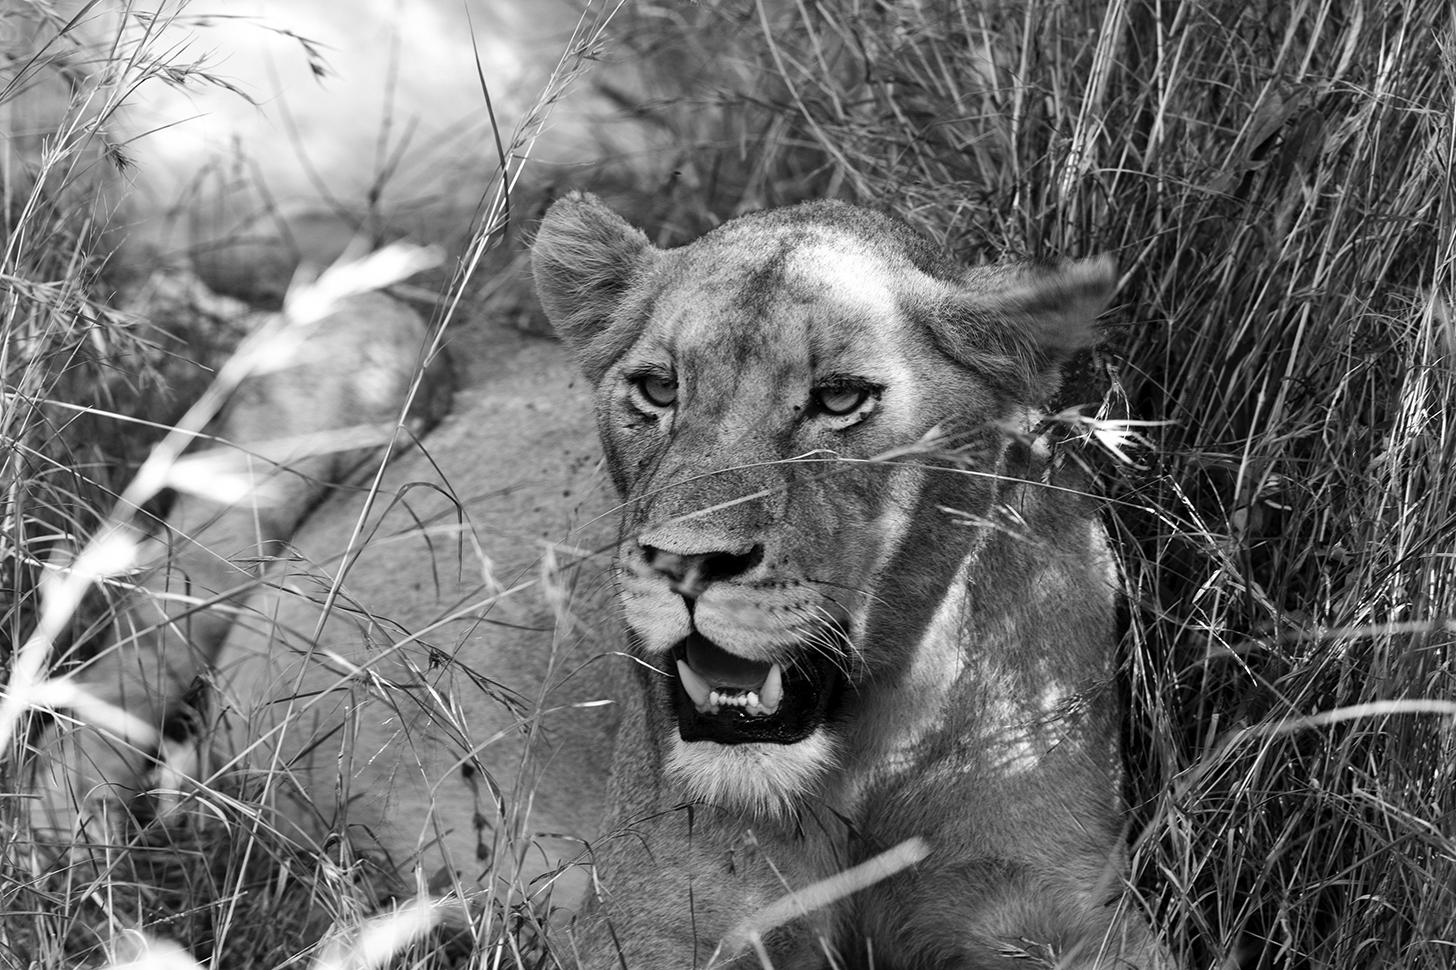 Wild Africa // Great Kruger Park, South Africa